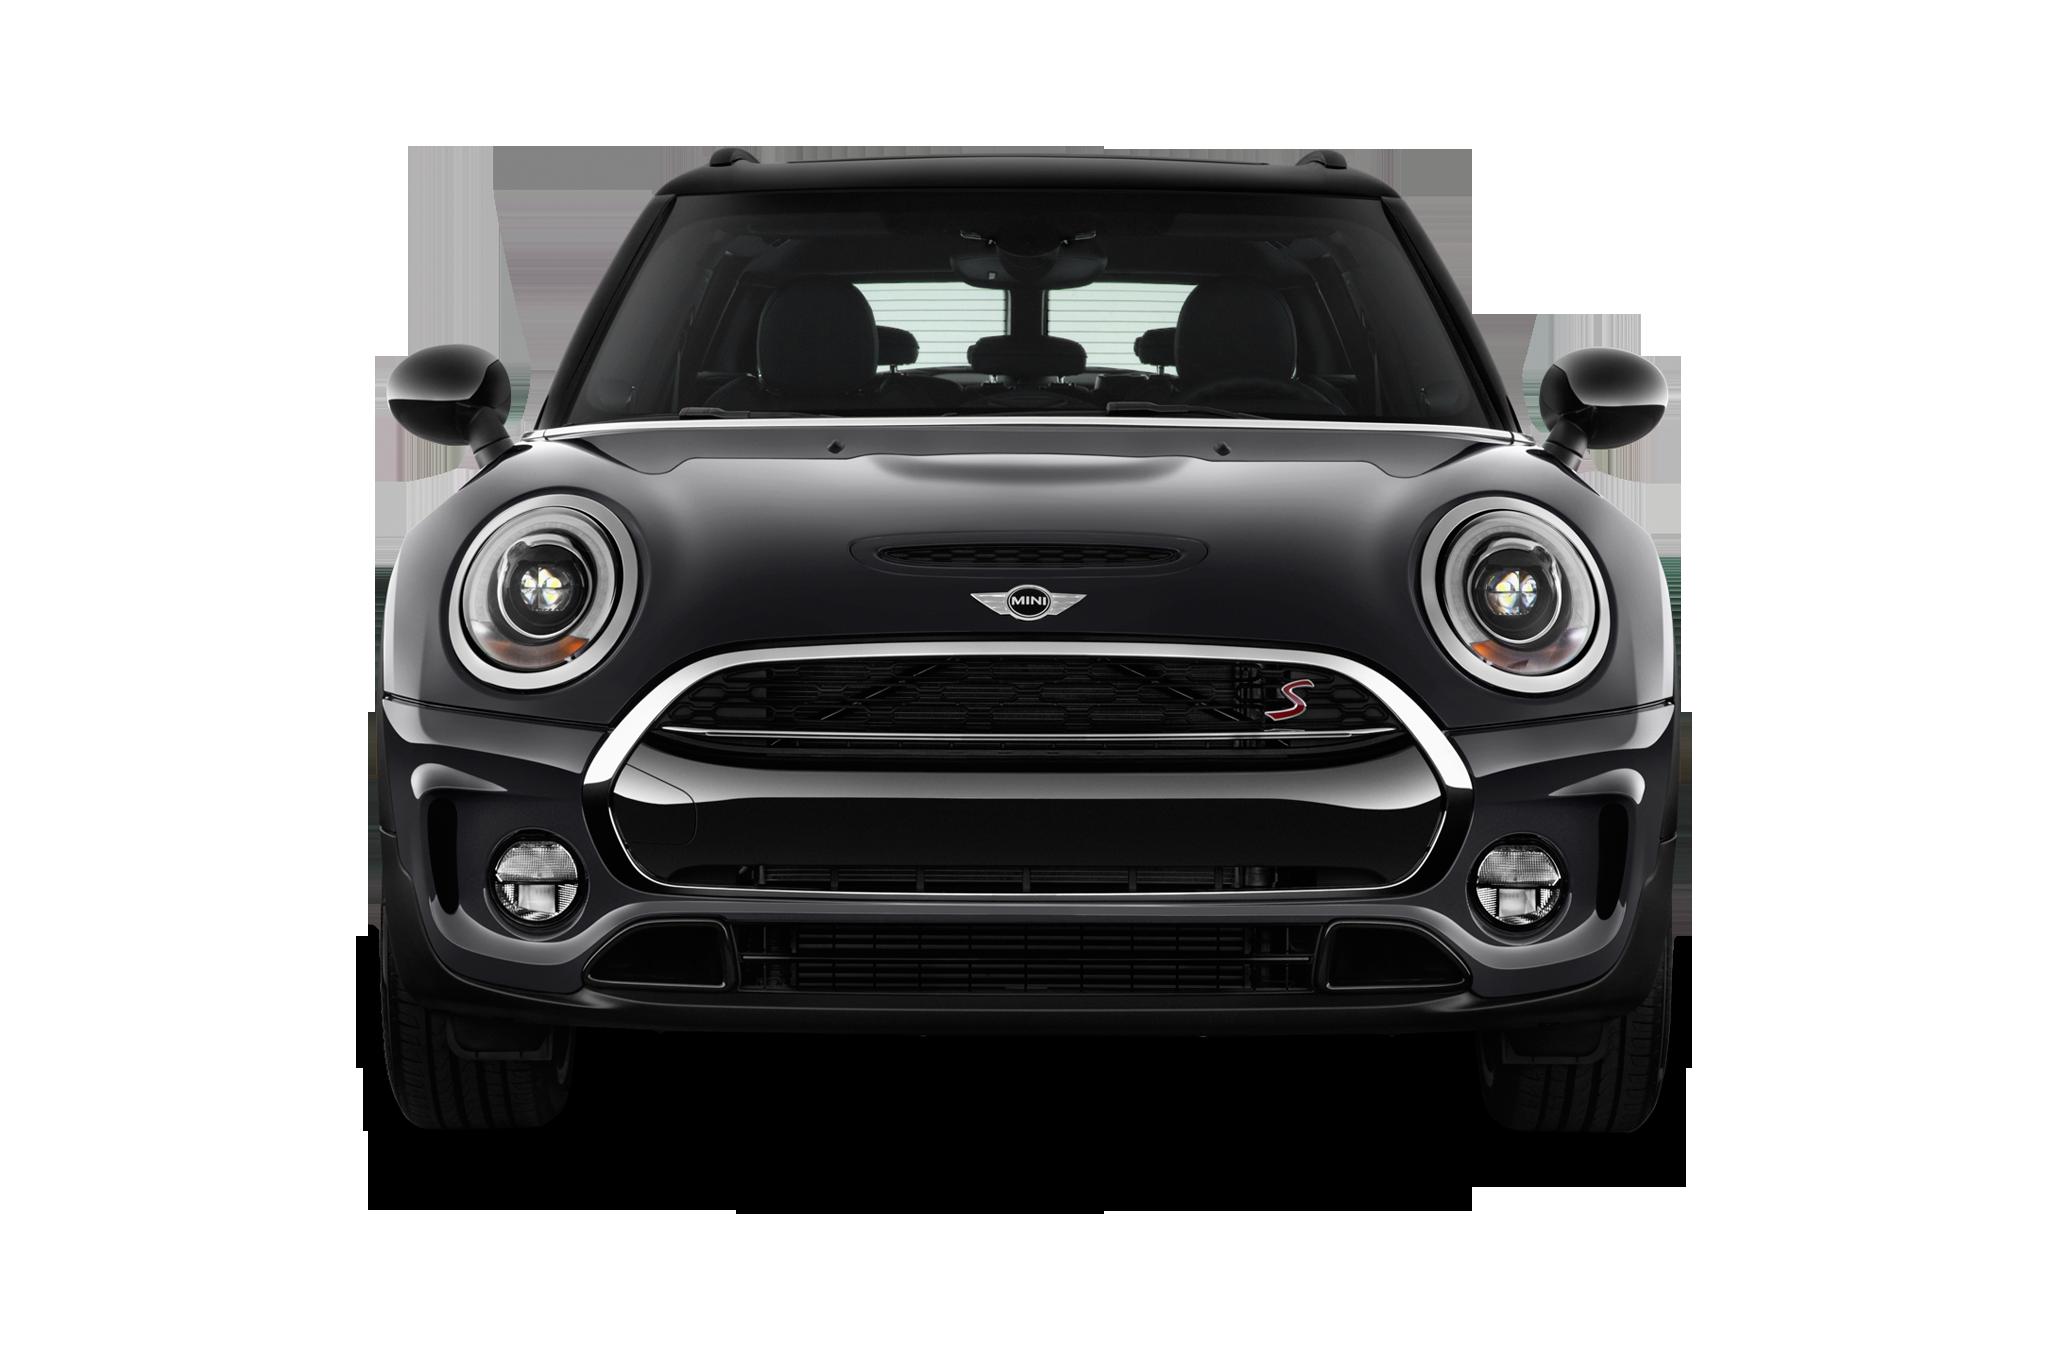 2016 Mini Cooper Clubman Black